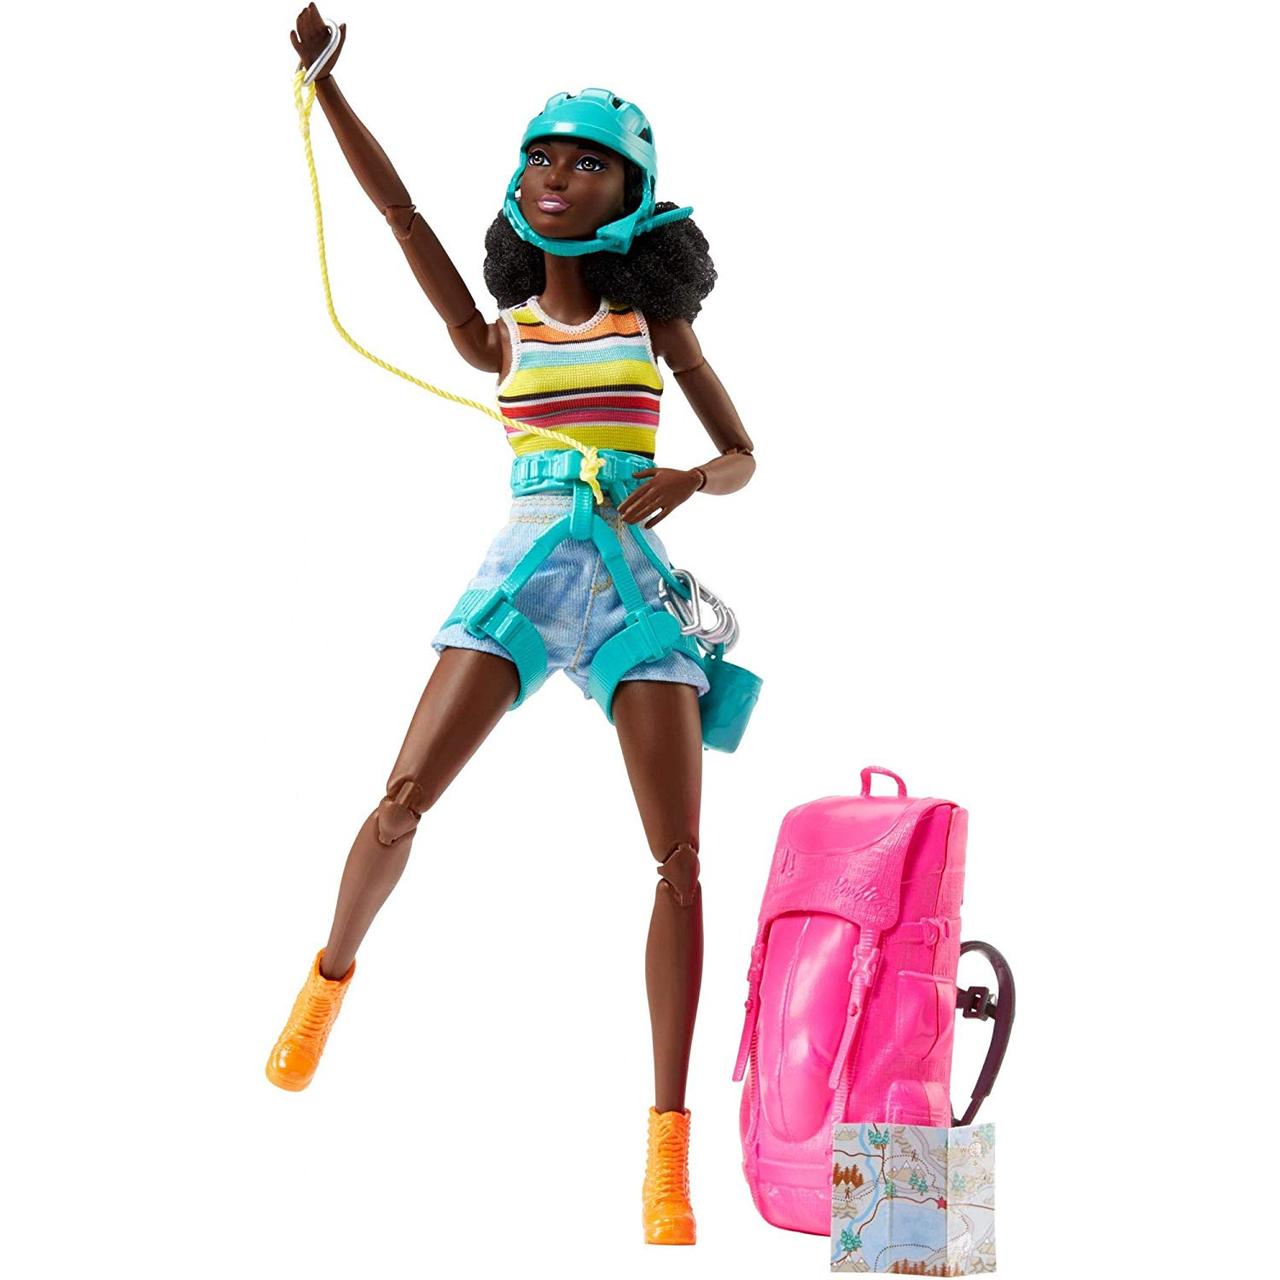 Барби Скалолазка Афроамериканка